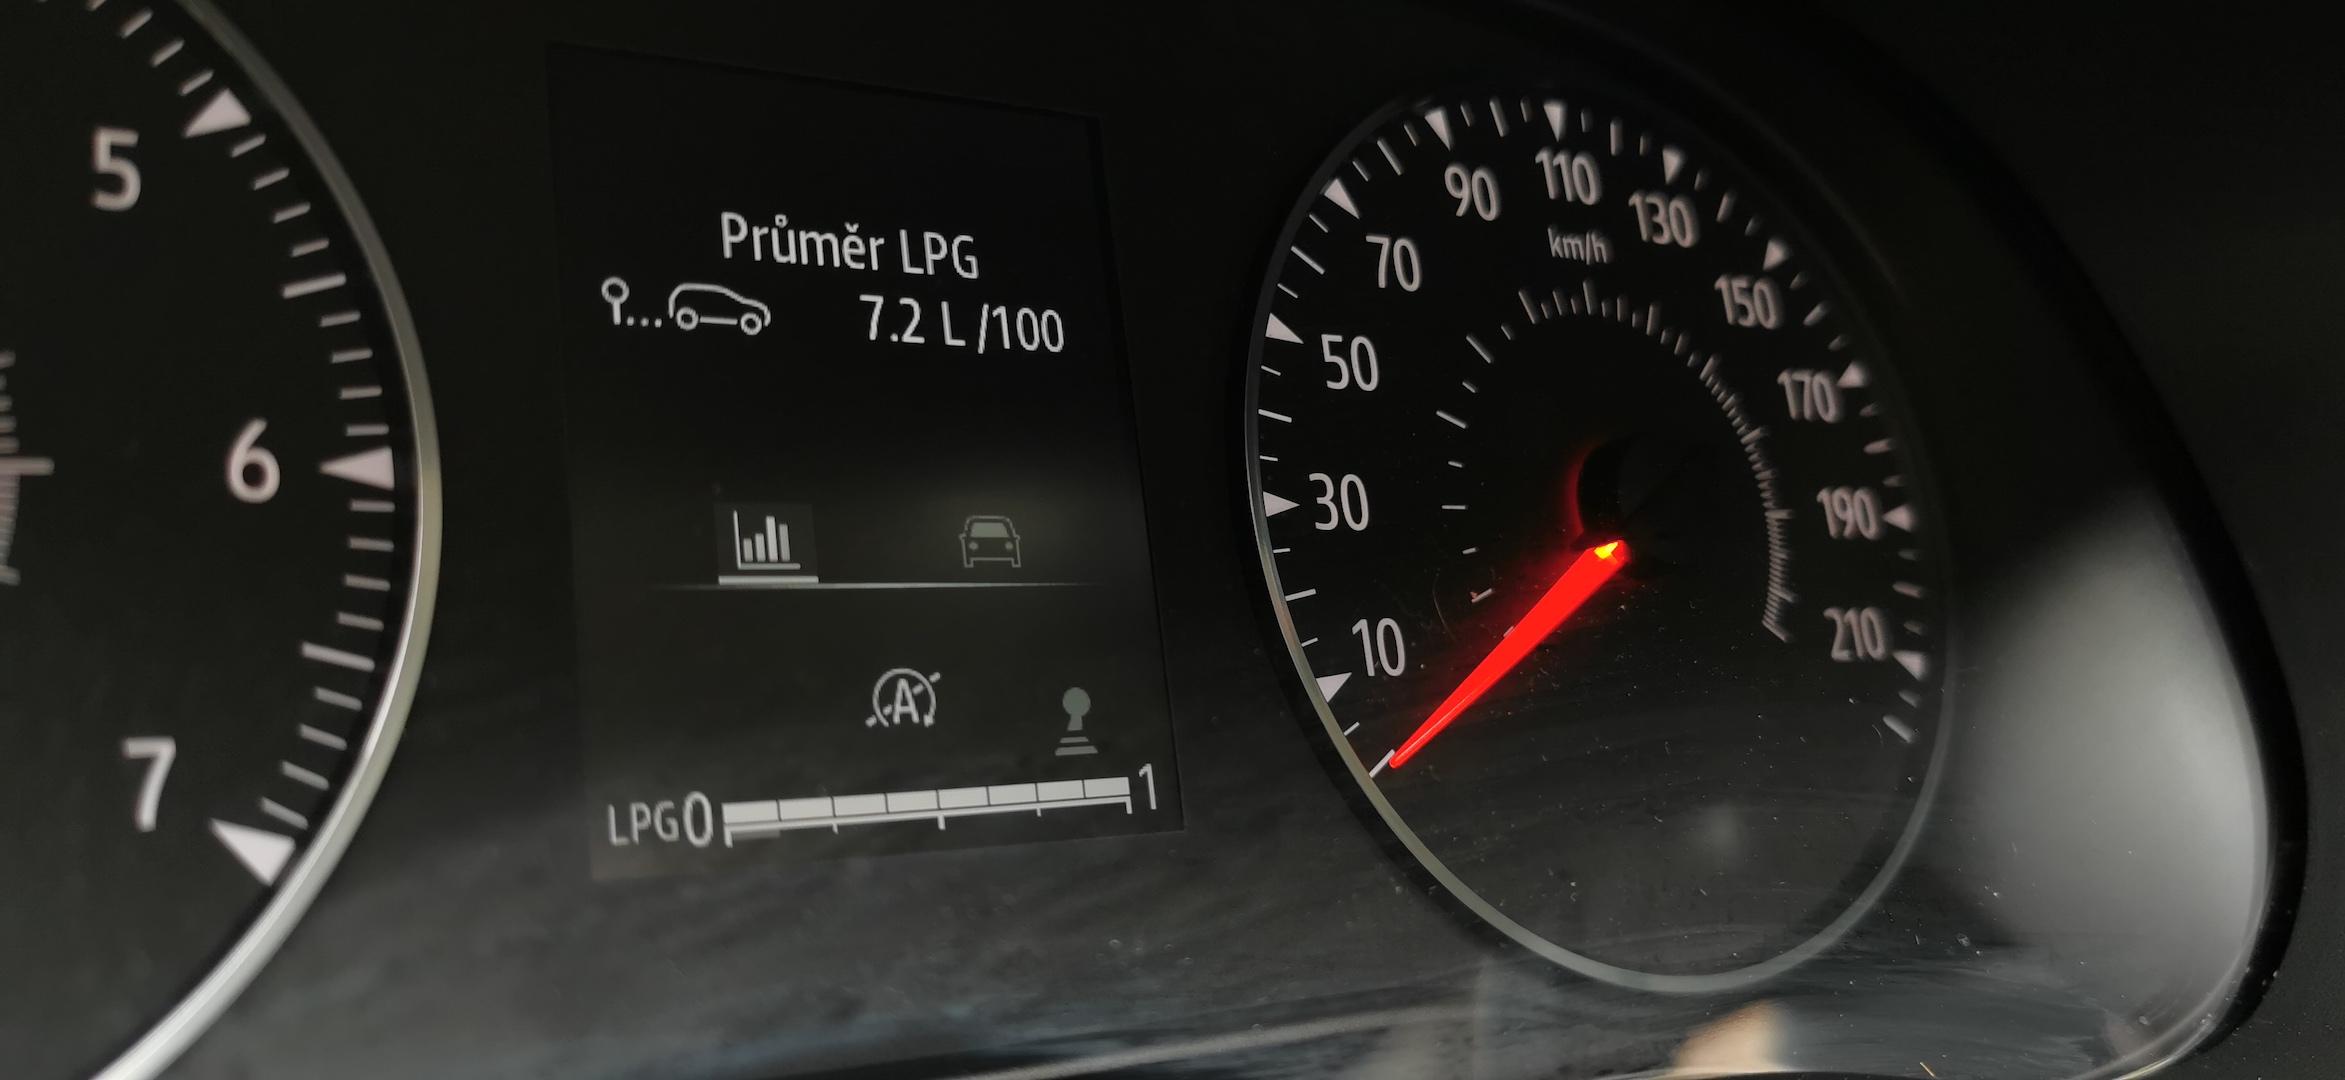 Dacia Sandero Stepway 1,0 TCe LPG - kombinovaná spotřeba